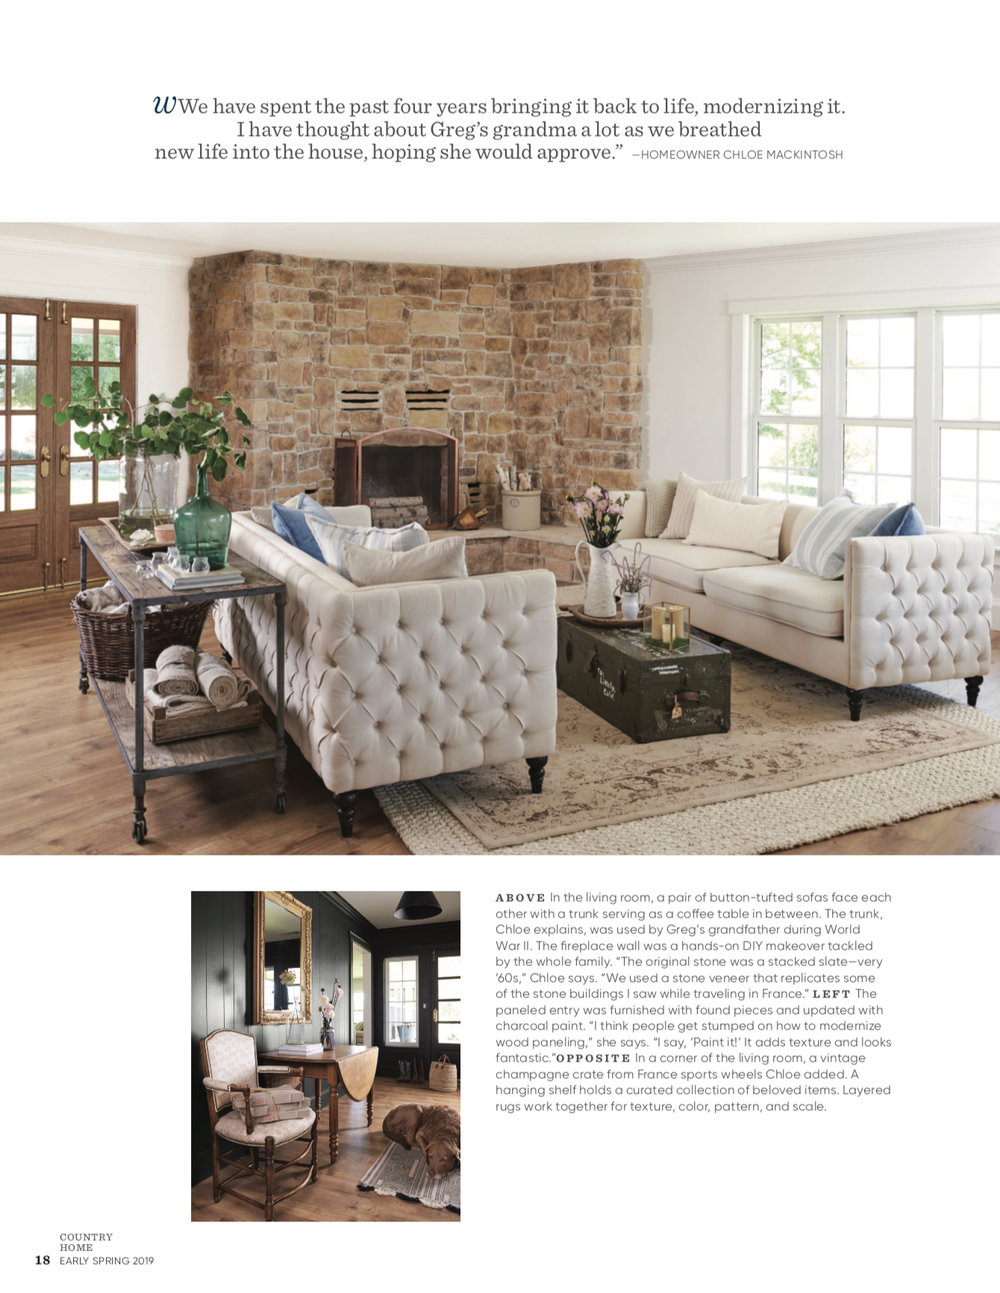 Farmhouse+living+room+design+with+stone+veneer+fireplace+and+tufted+couches+ +#farmhousedecor+#farmhouselivingroom copy.jpg